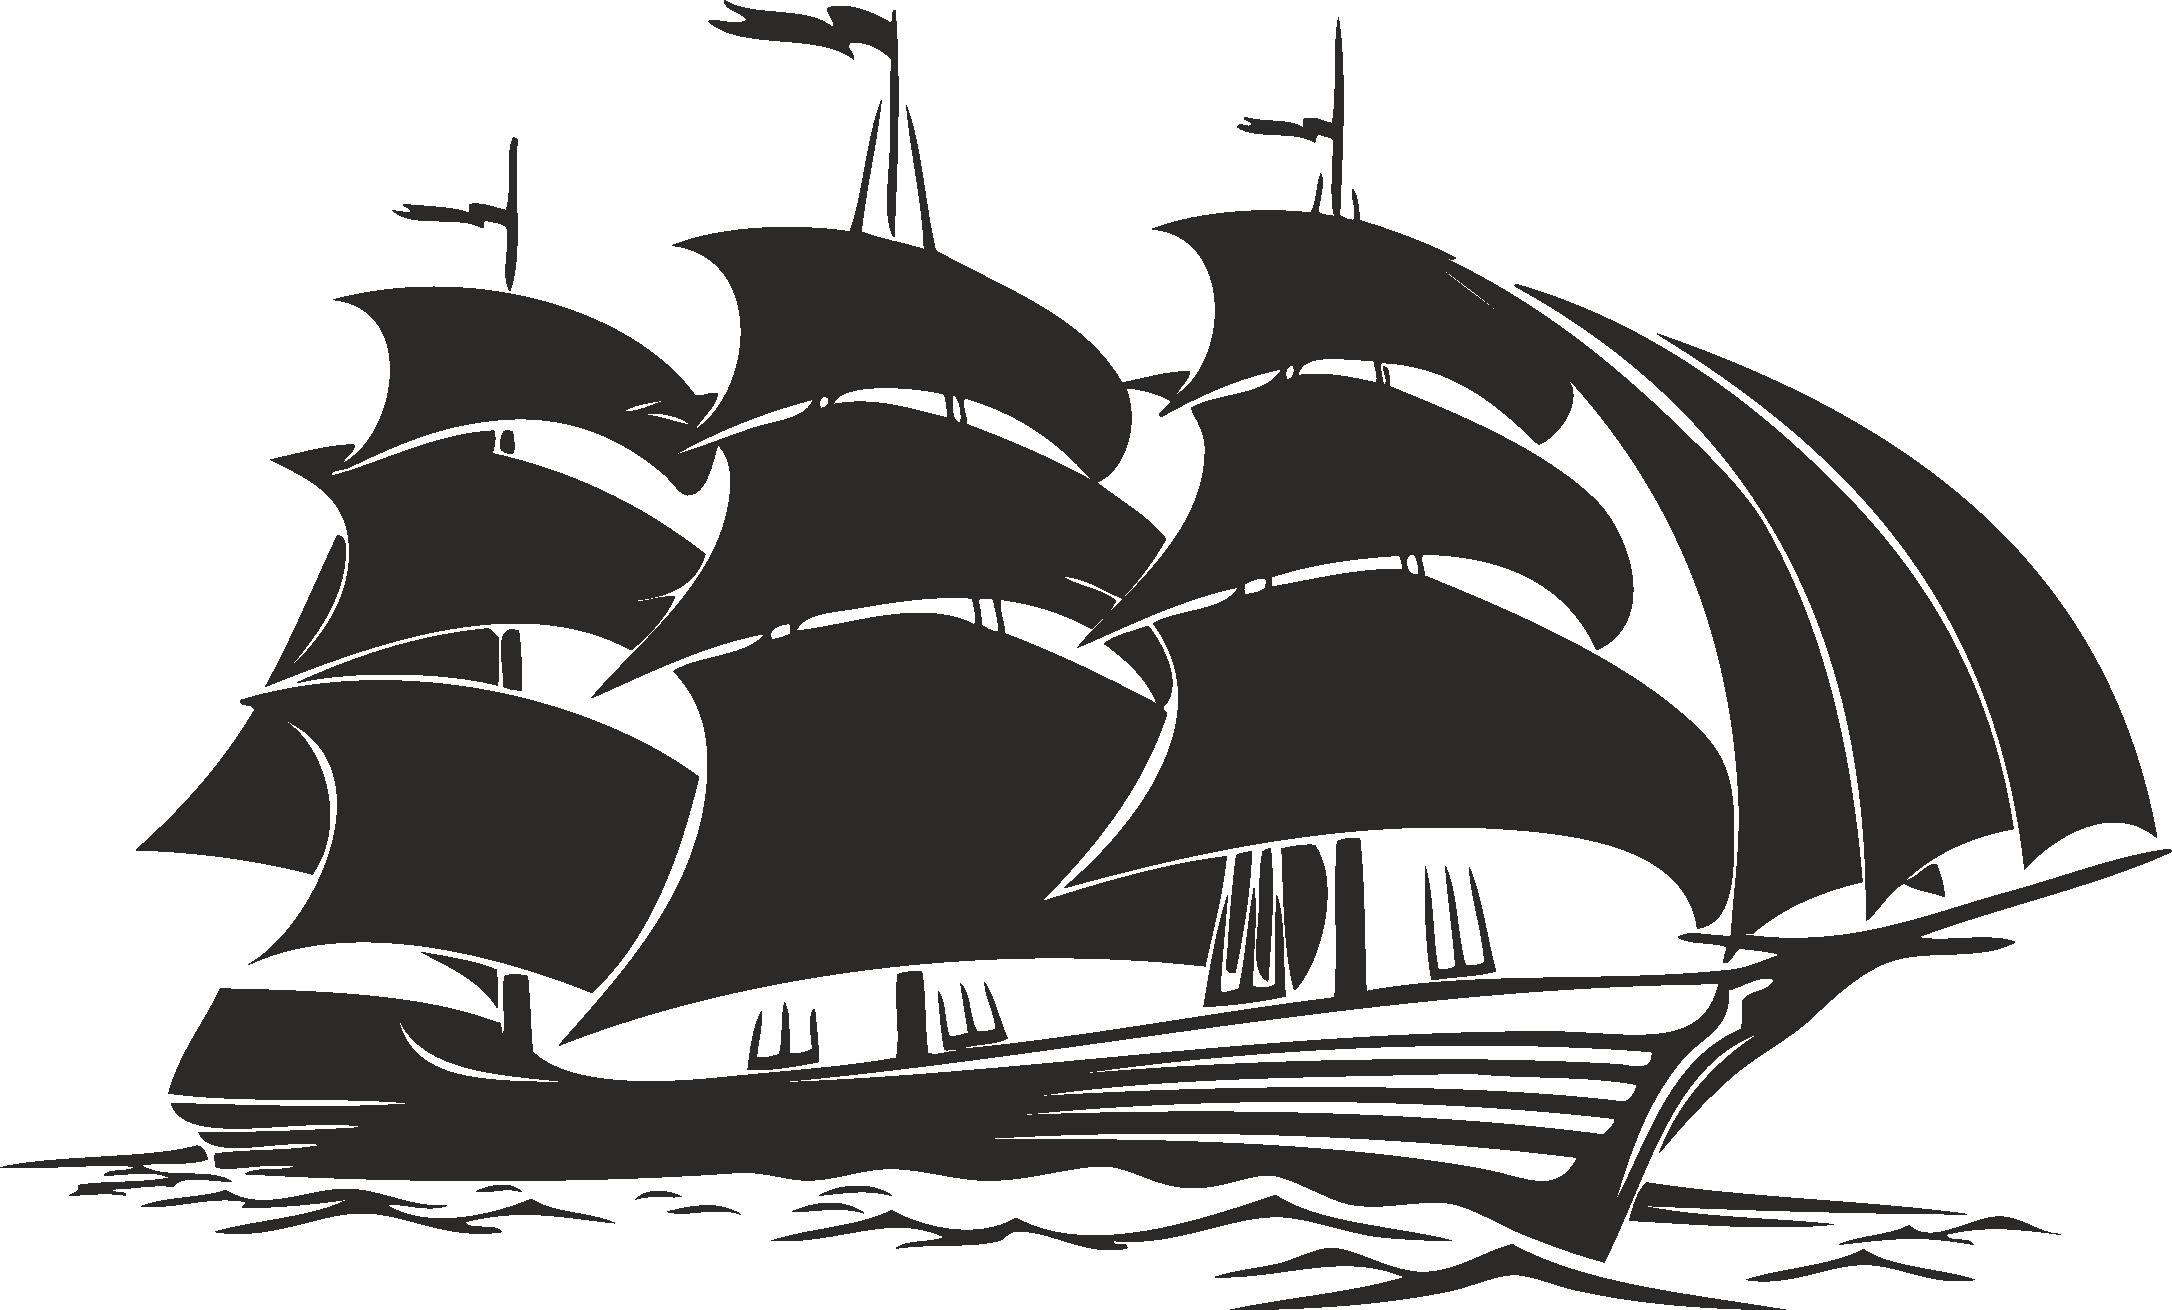 Sailboat Beautiful Silhouettes Of Sailing Ships 03 Free DXF File